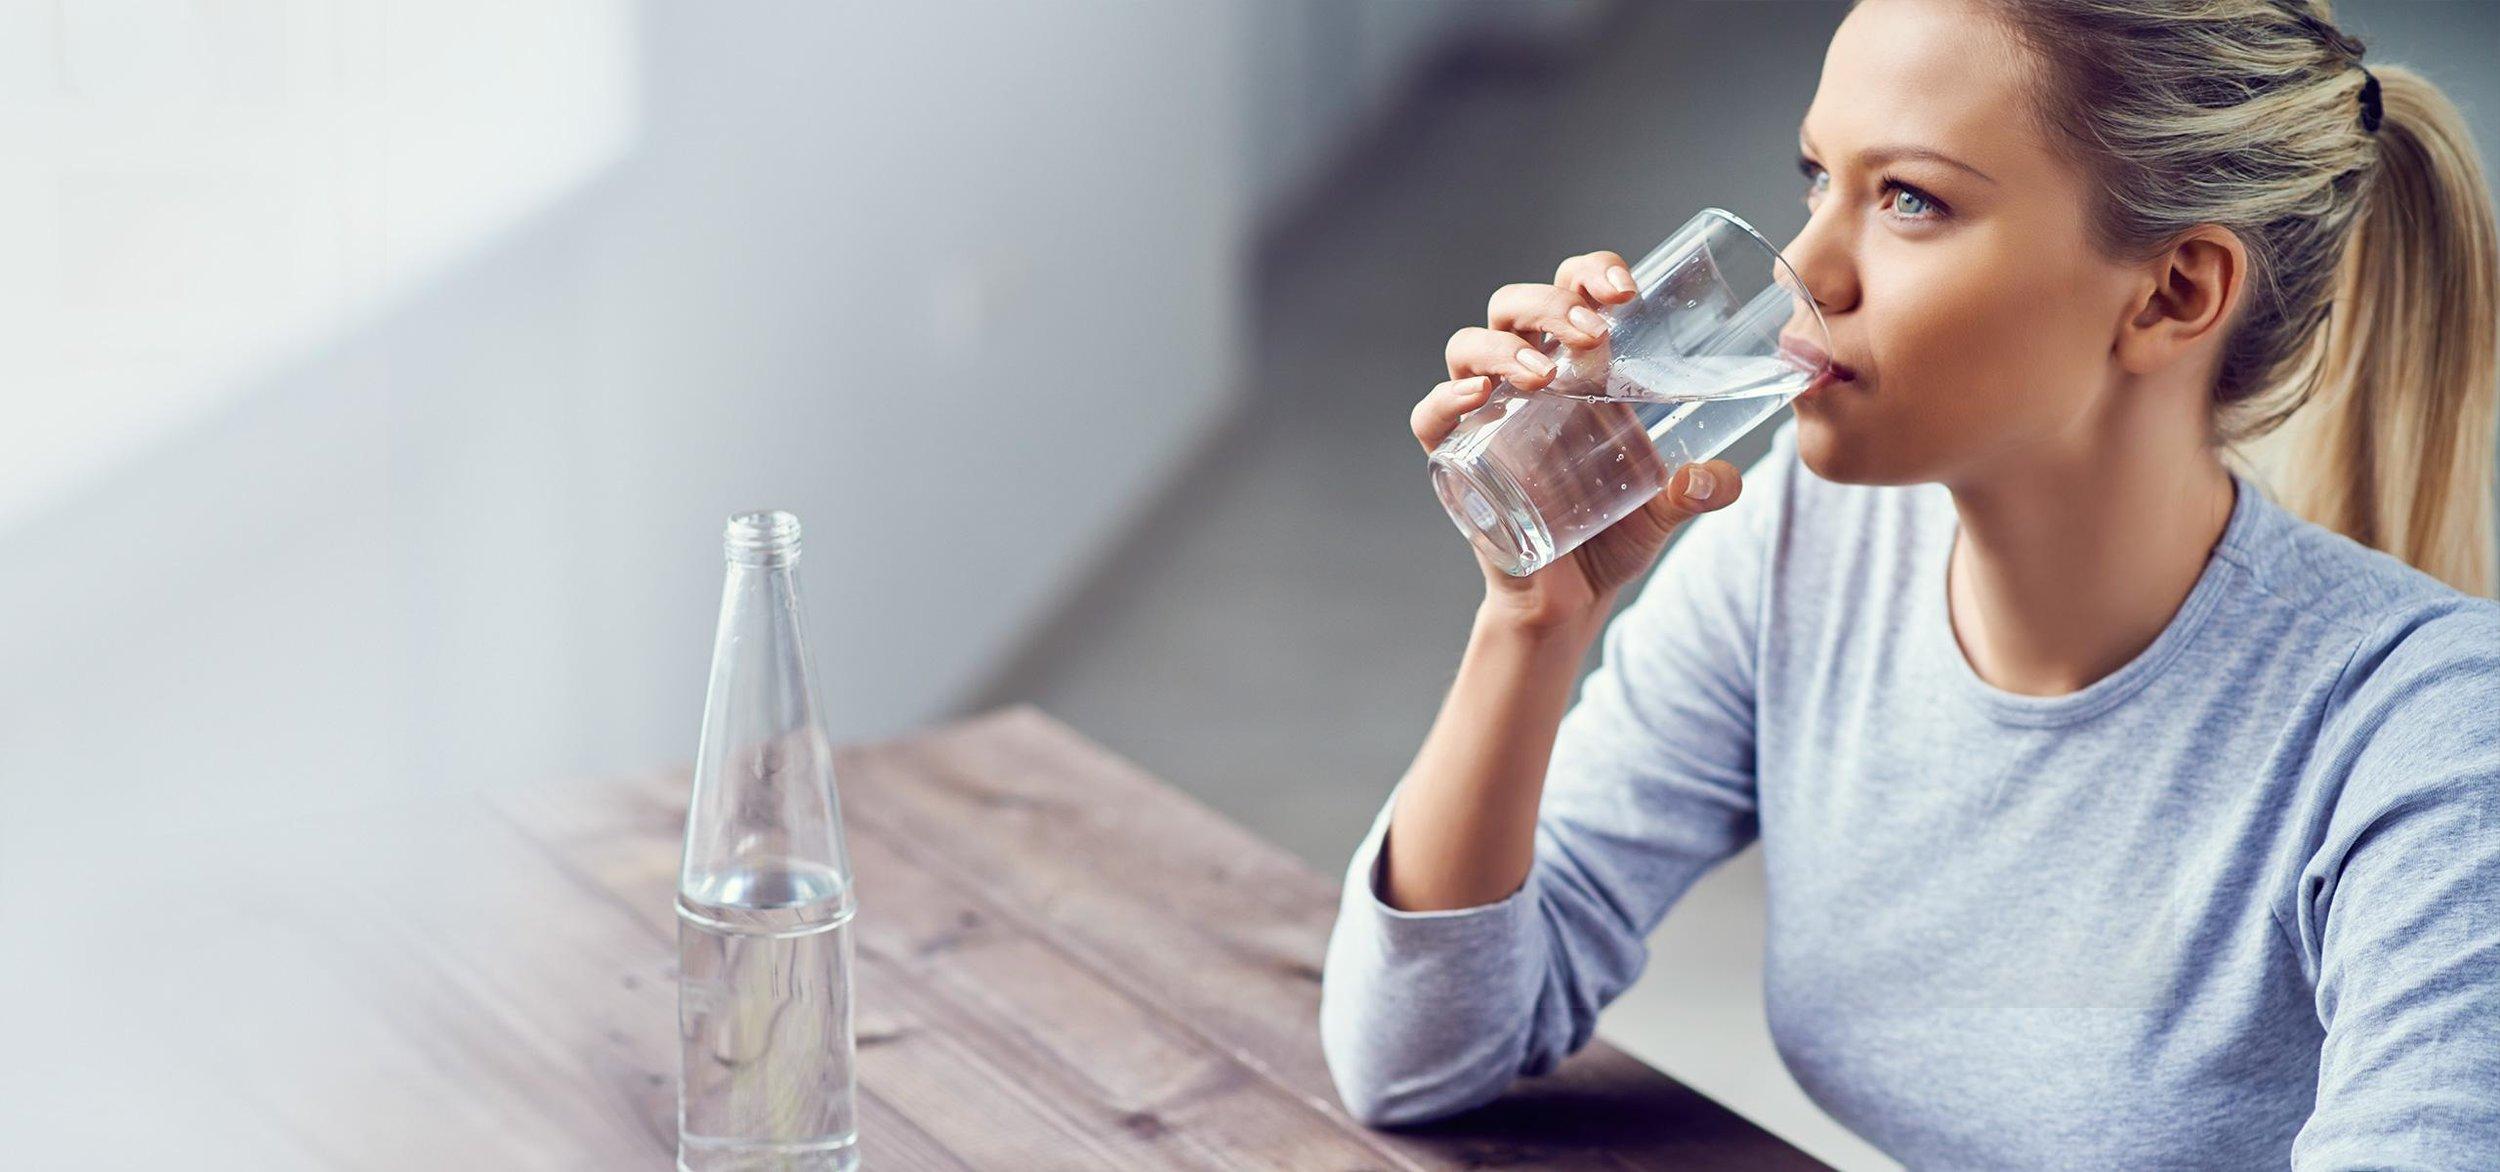 brita_experience_personal_hydration_needs_woman_drinking_water-1.jpg